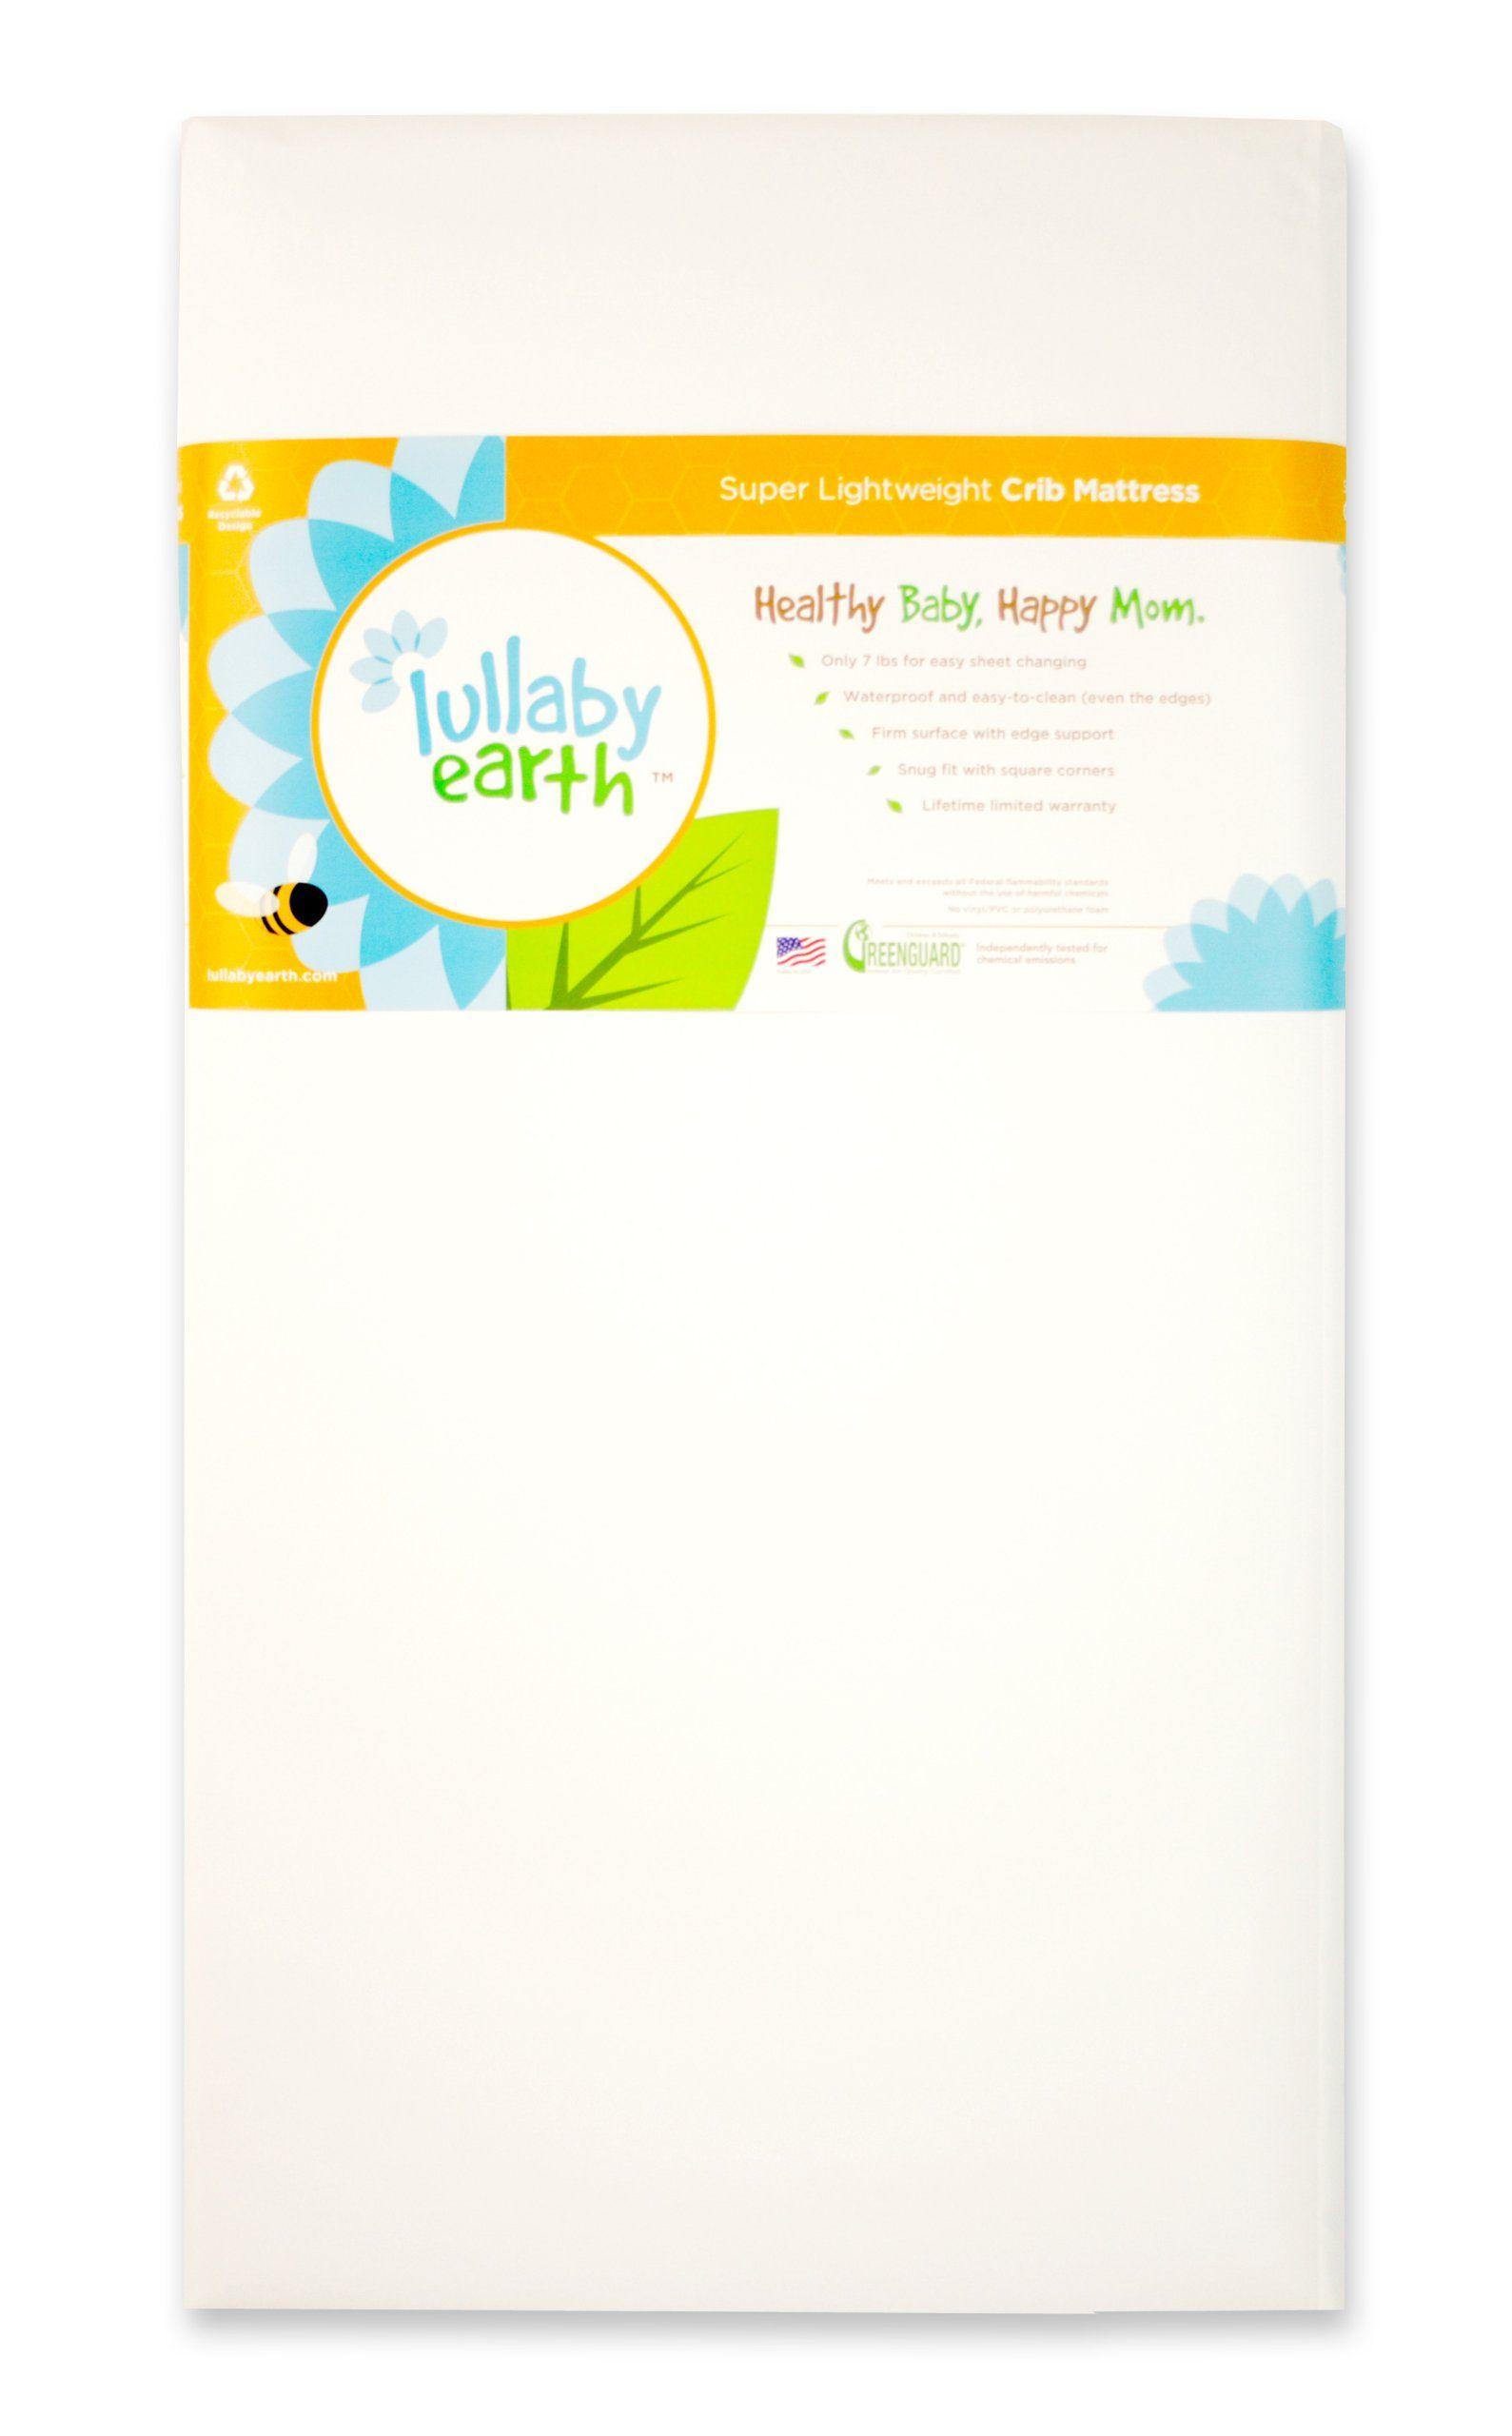 Baby crib mattress amazon - Amazon Com Lullaby Earth Super Lightweight Crib Mattress Lullabye Earth Crib Mattress